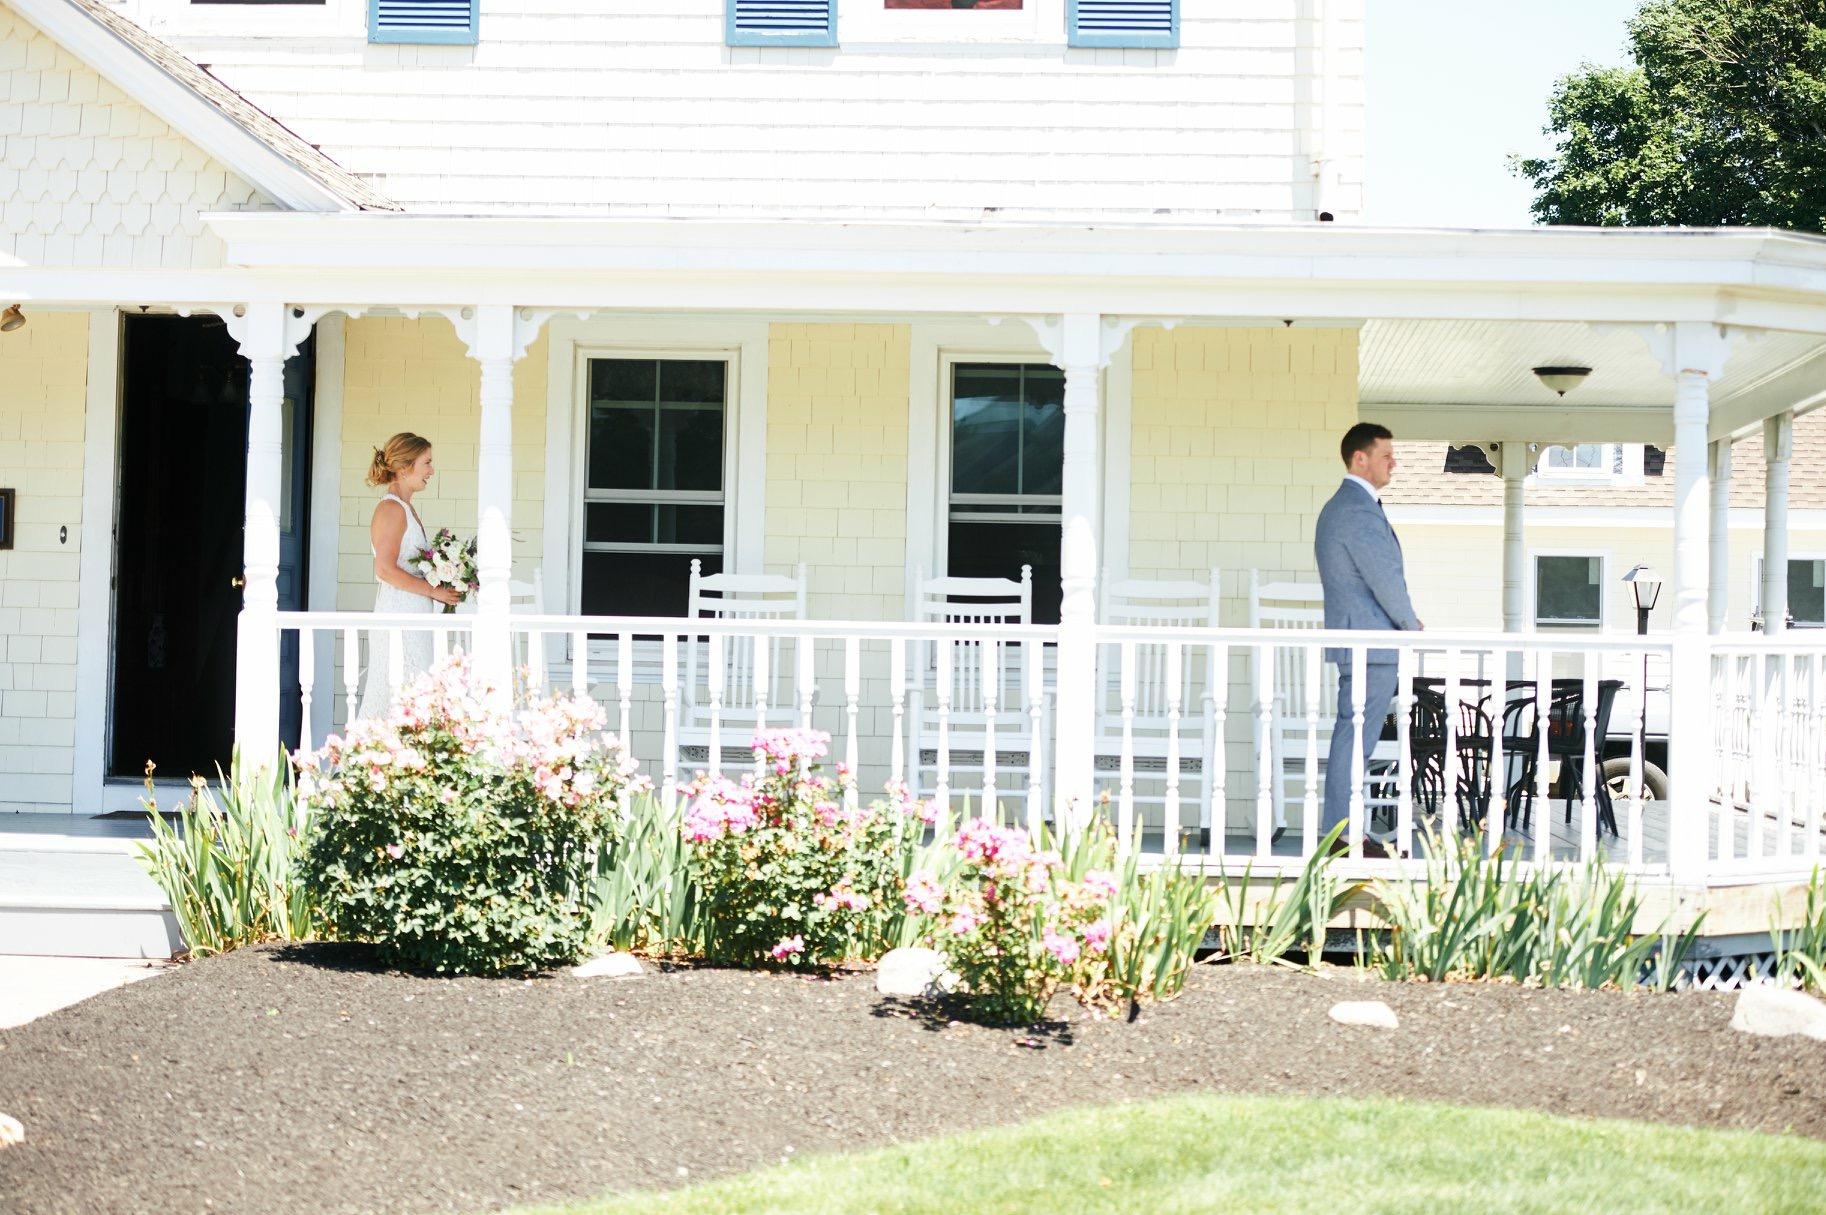 Ananda & Jason's first look in Rhode Island - Pearl Weddings & Events